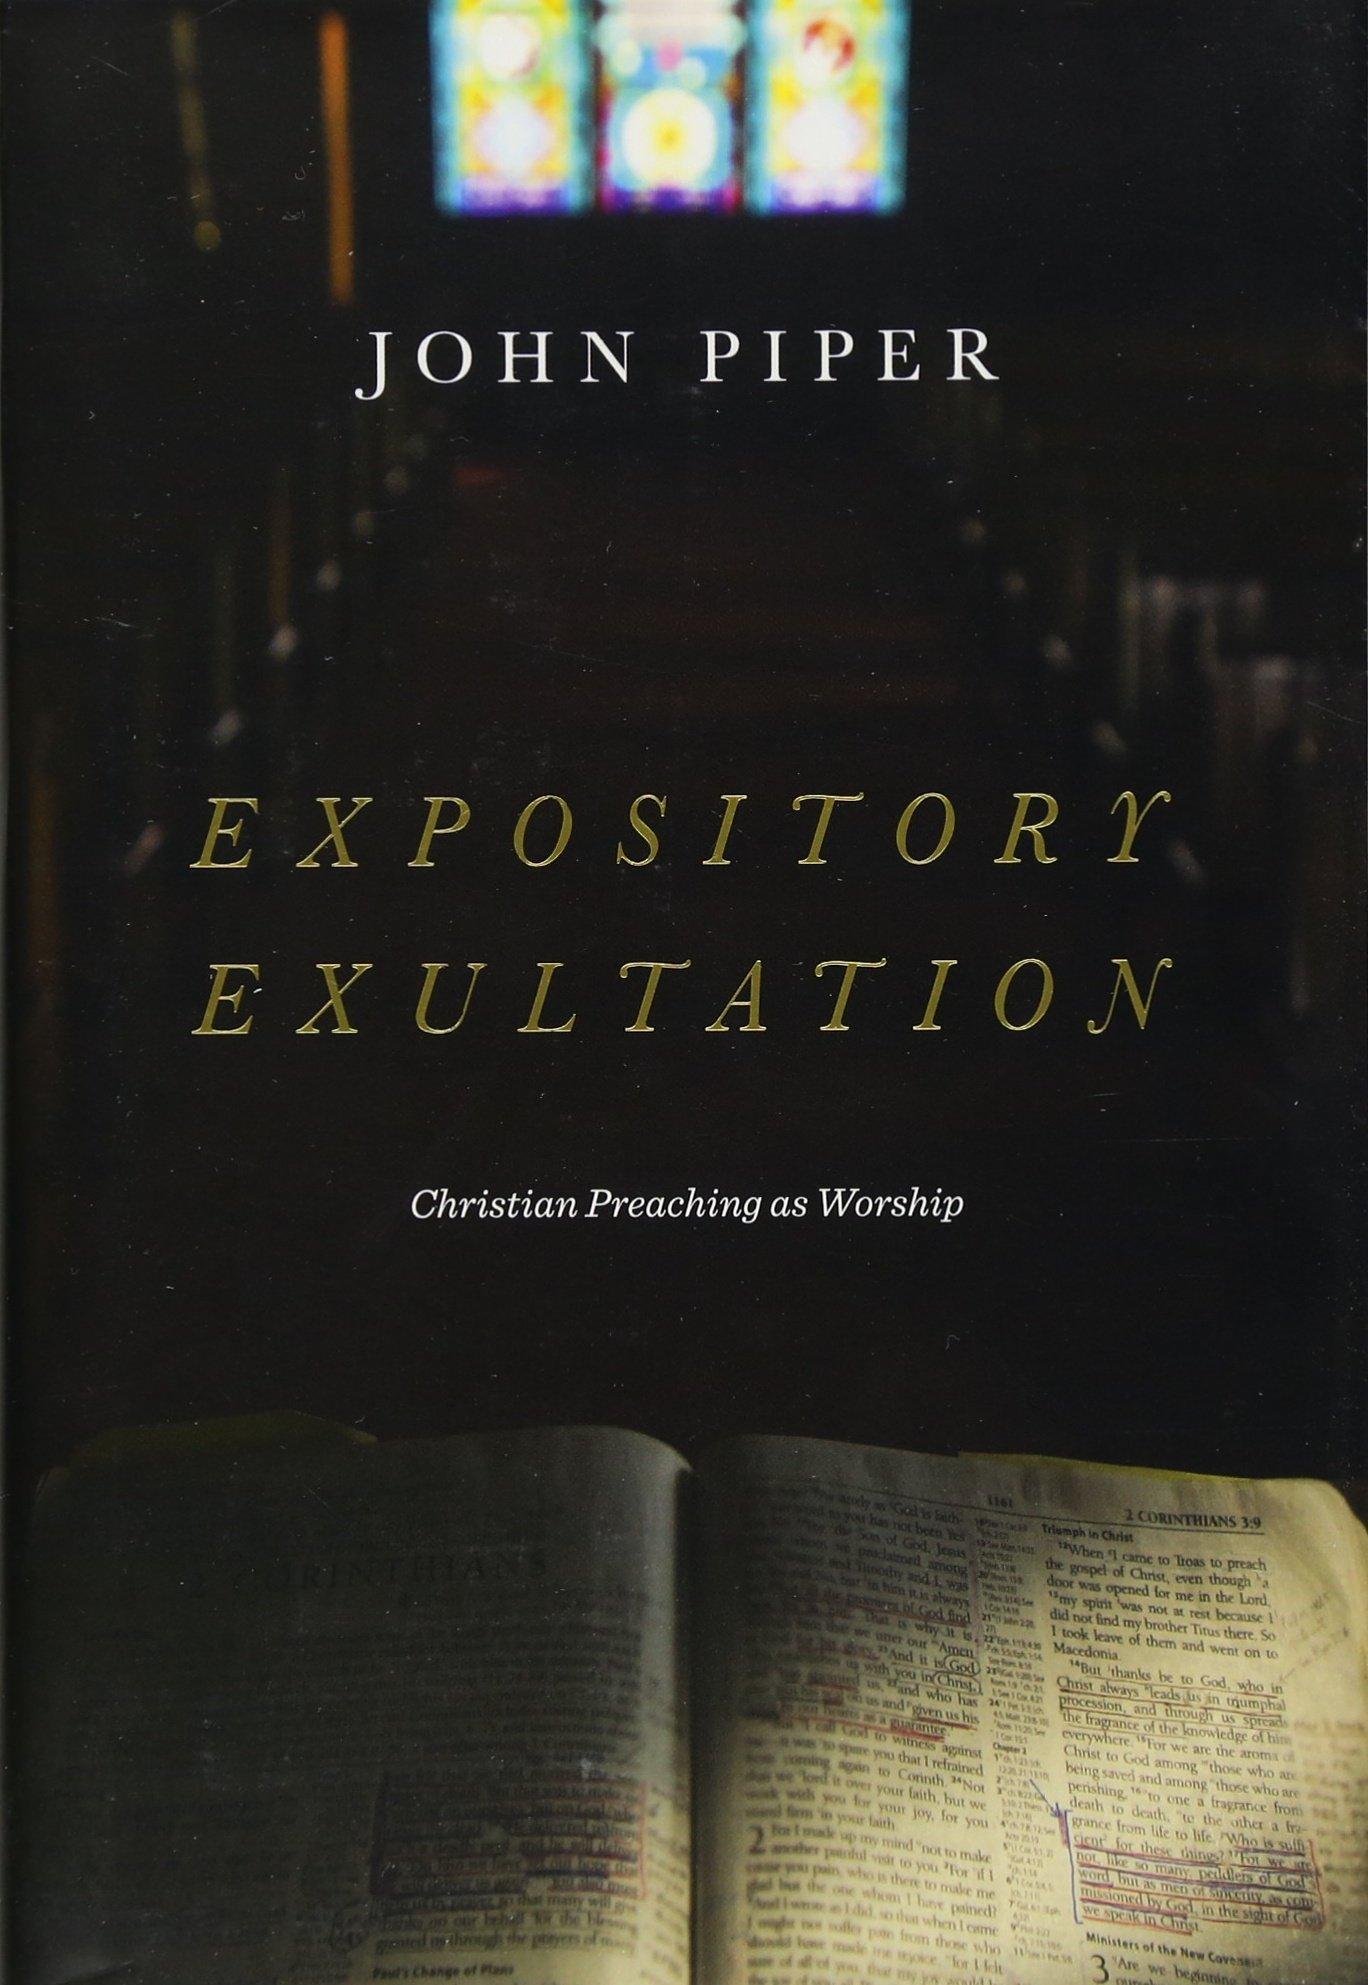 Expository Exultation: Christian Preaching as Worship pdf